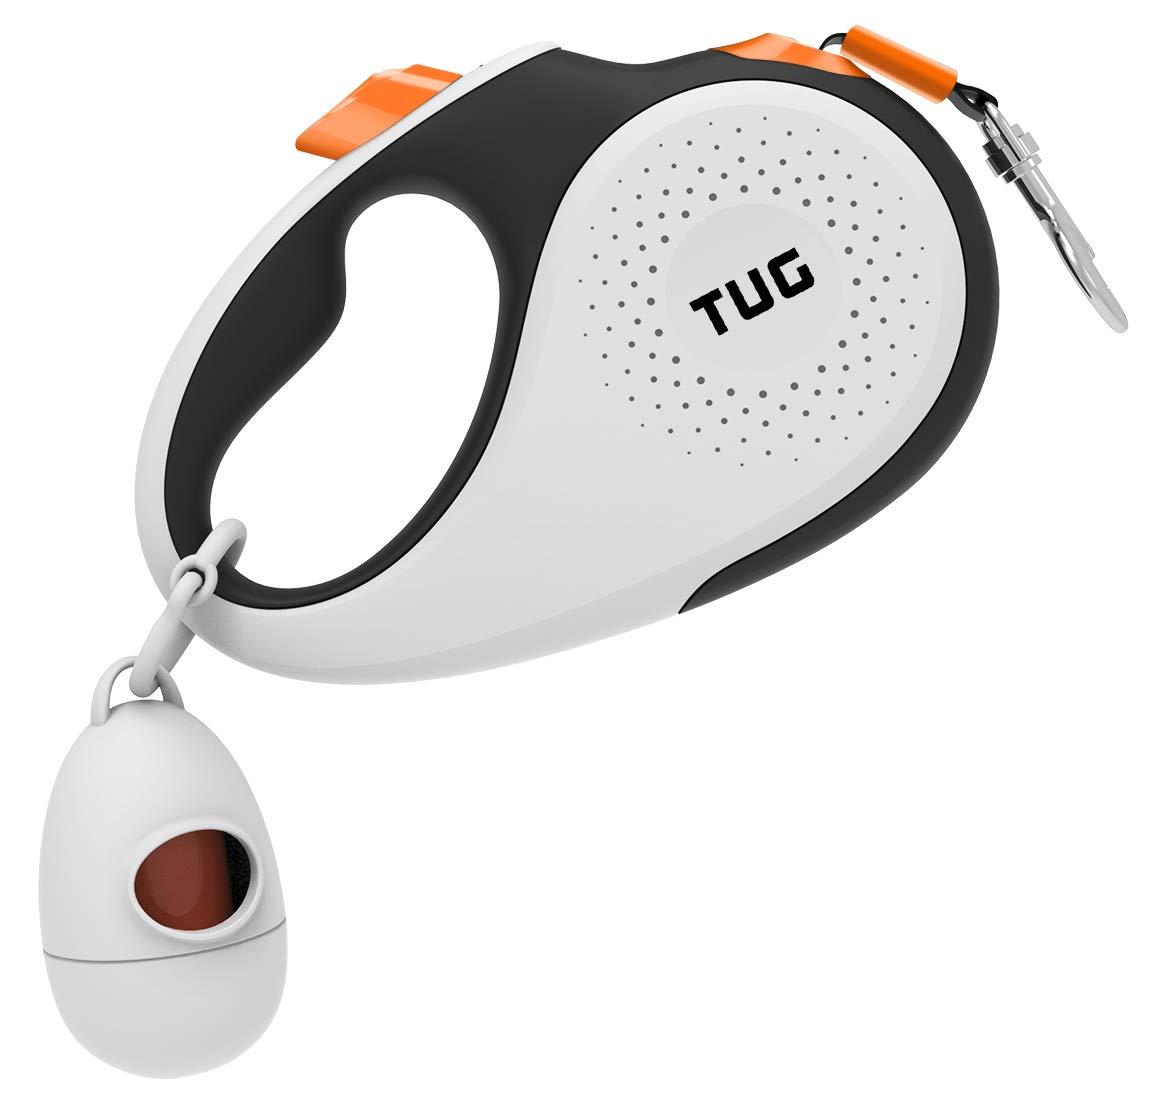 TUG Medium White/Orange Dog Retractable Leash Kit